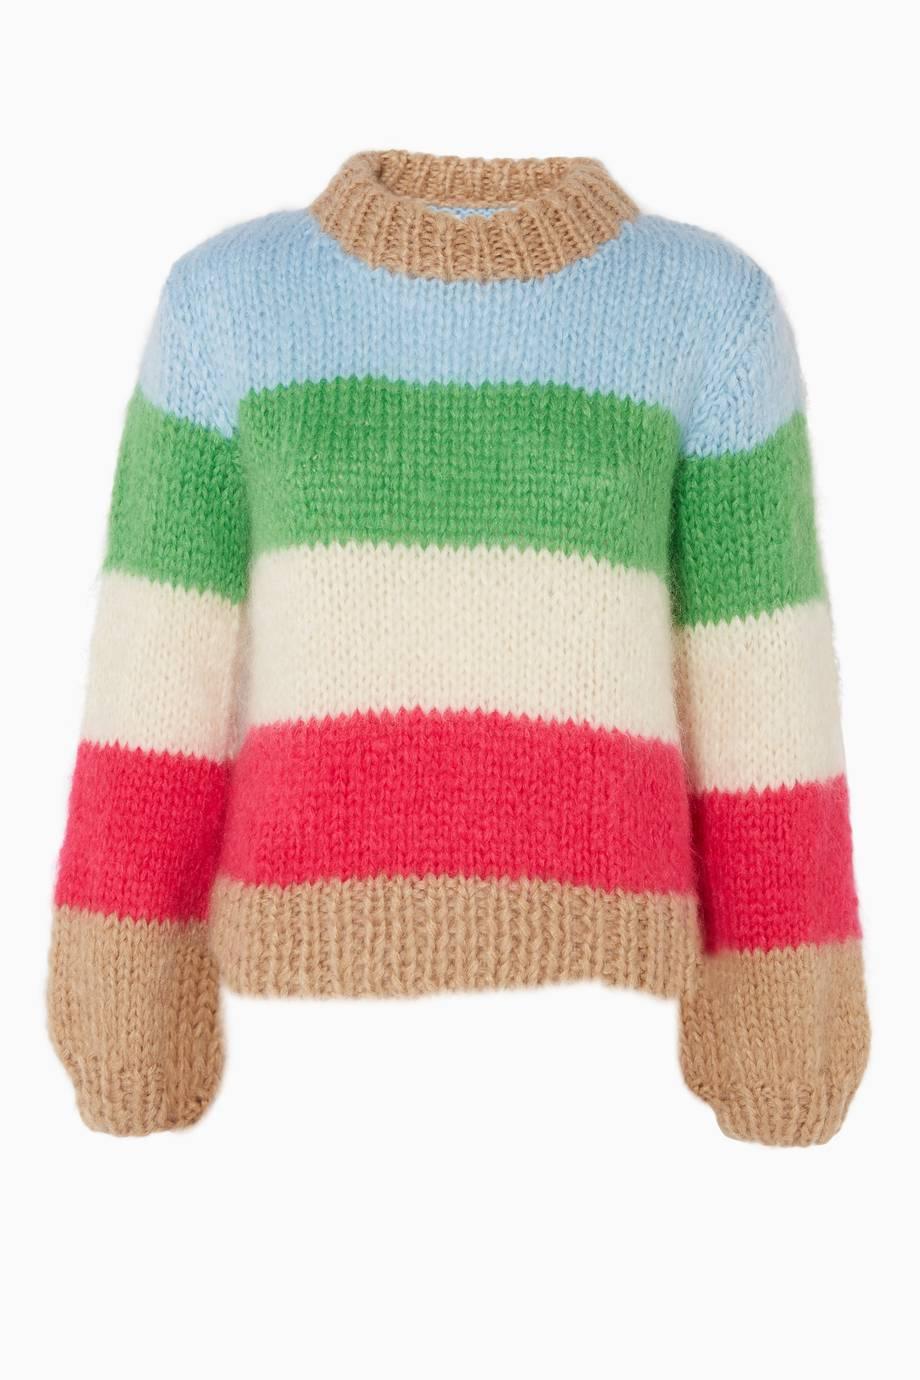 05349298d91 Shop Luxury Ganni Multi-Coloured Striped The Julliard Sweater ...